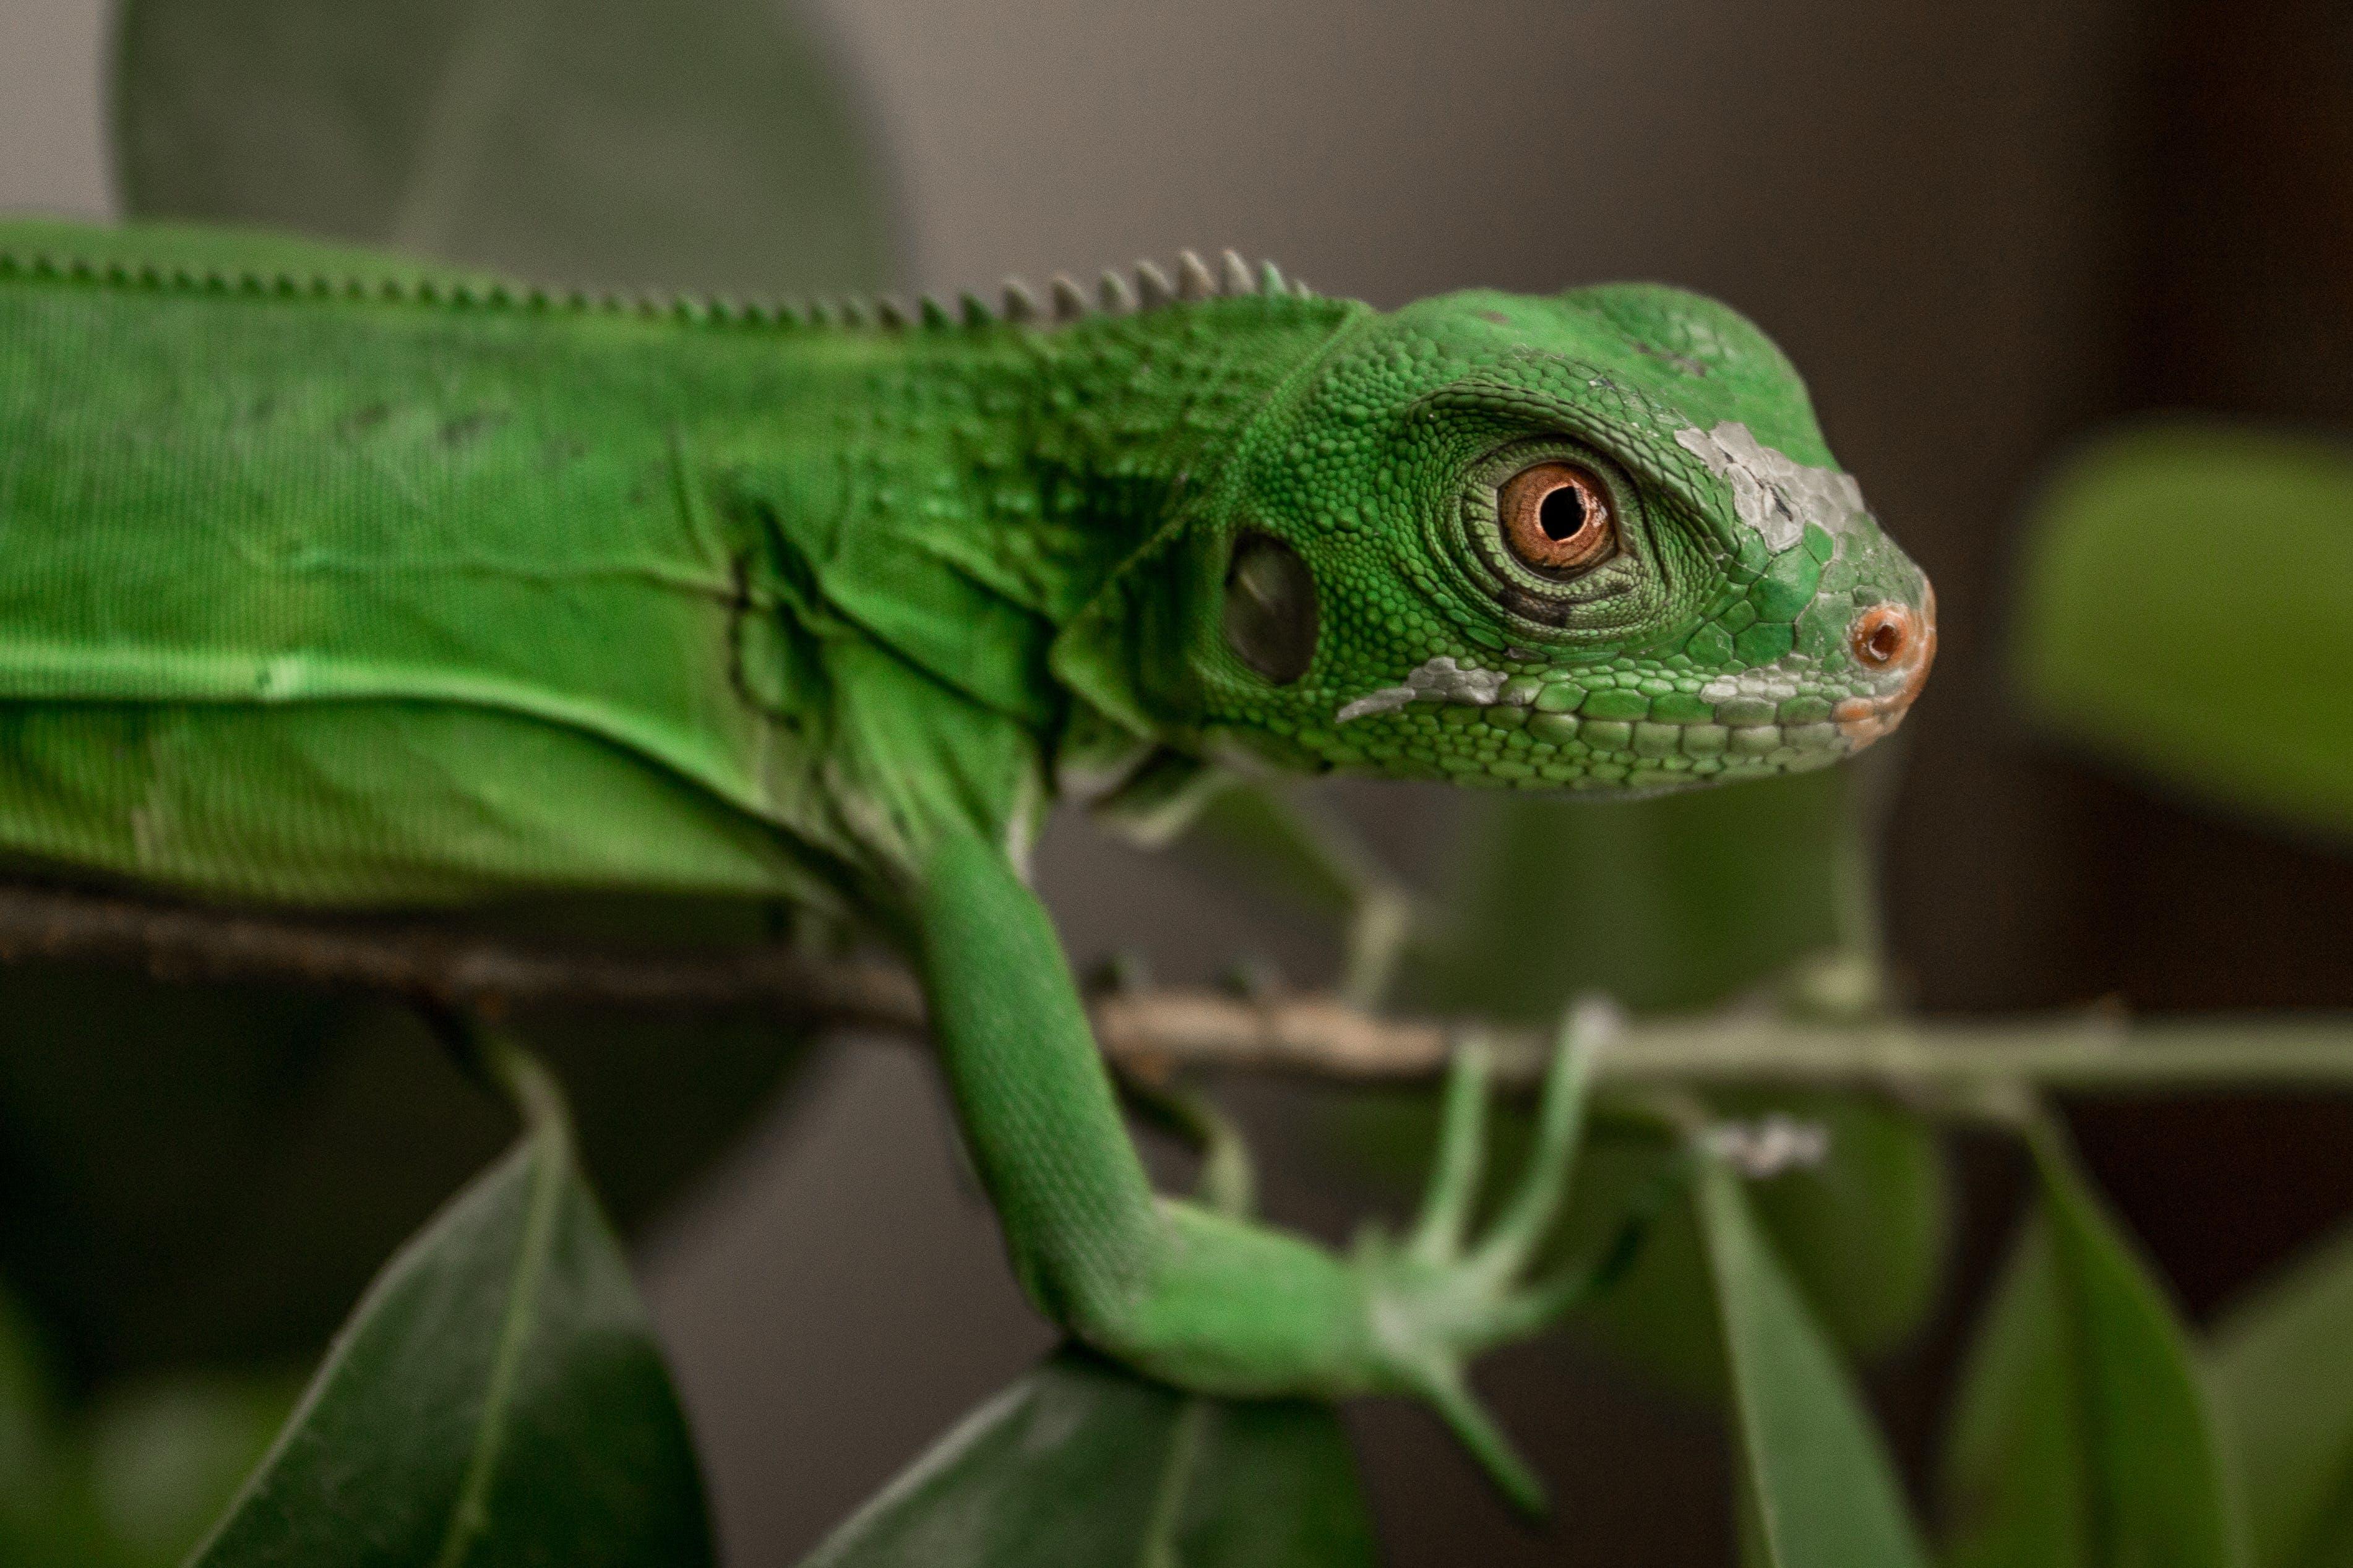 Green Lizard On A Plant